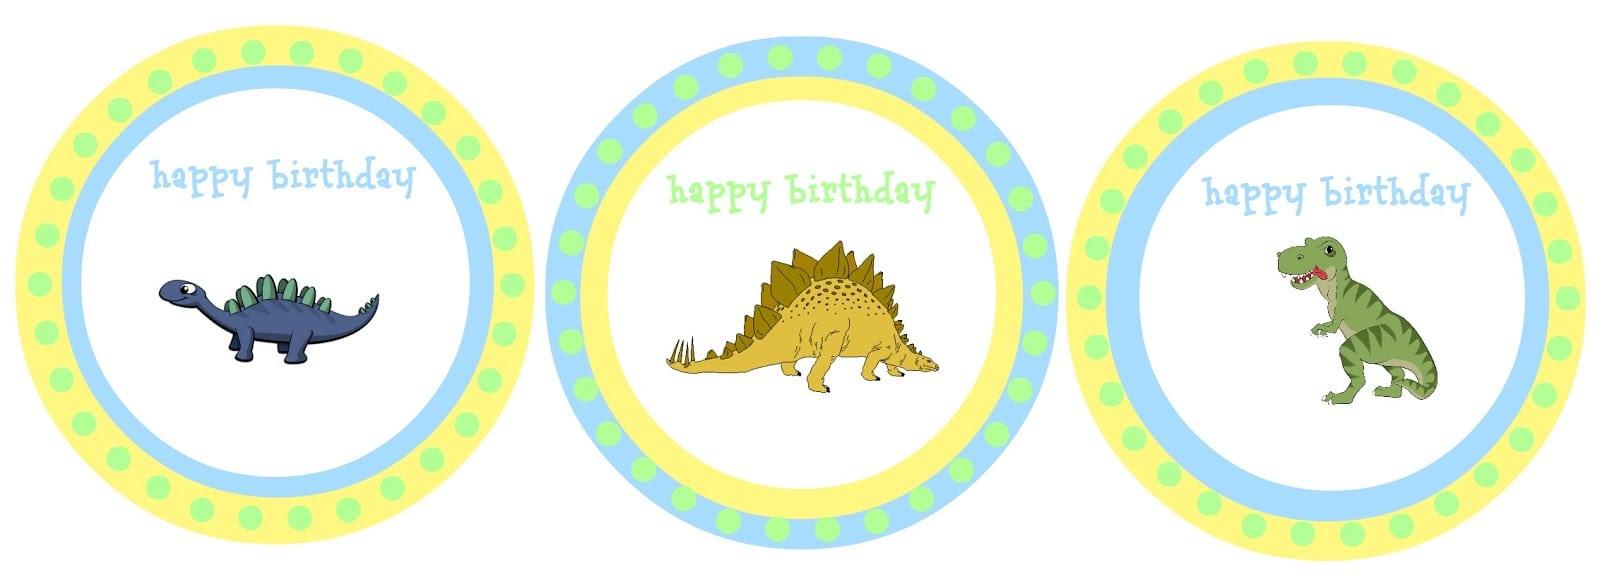 Dinosaur Party Invitations Free Printable